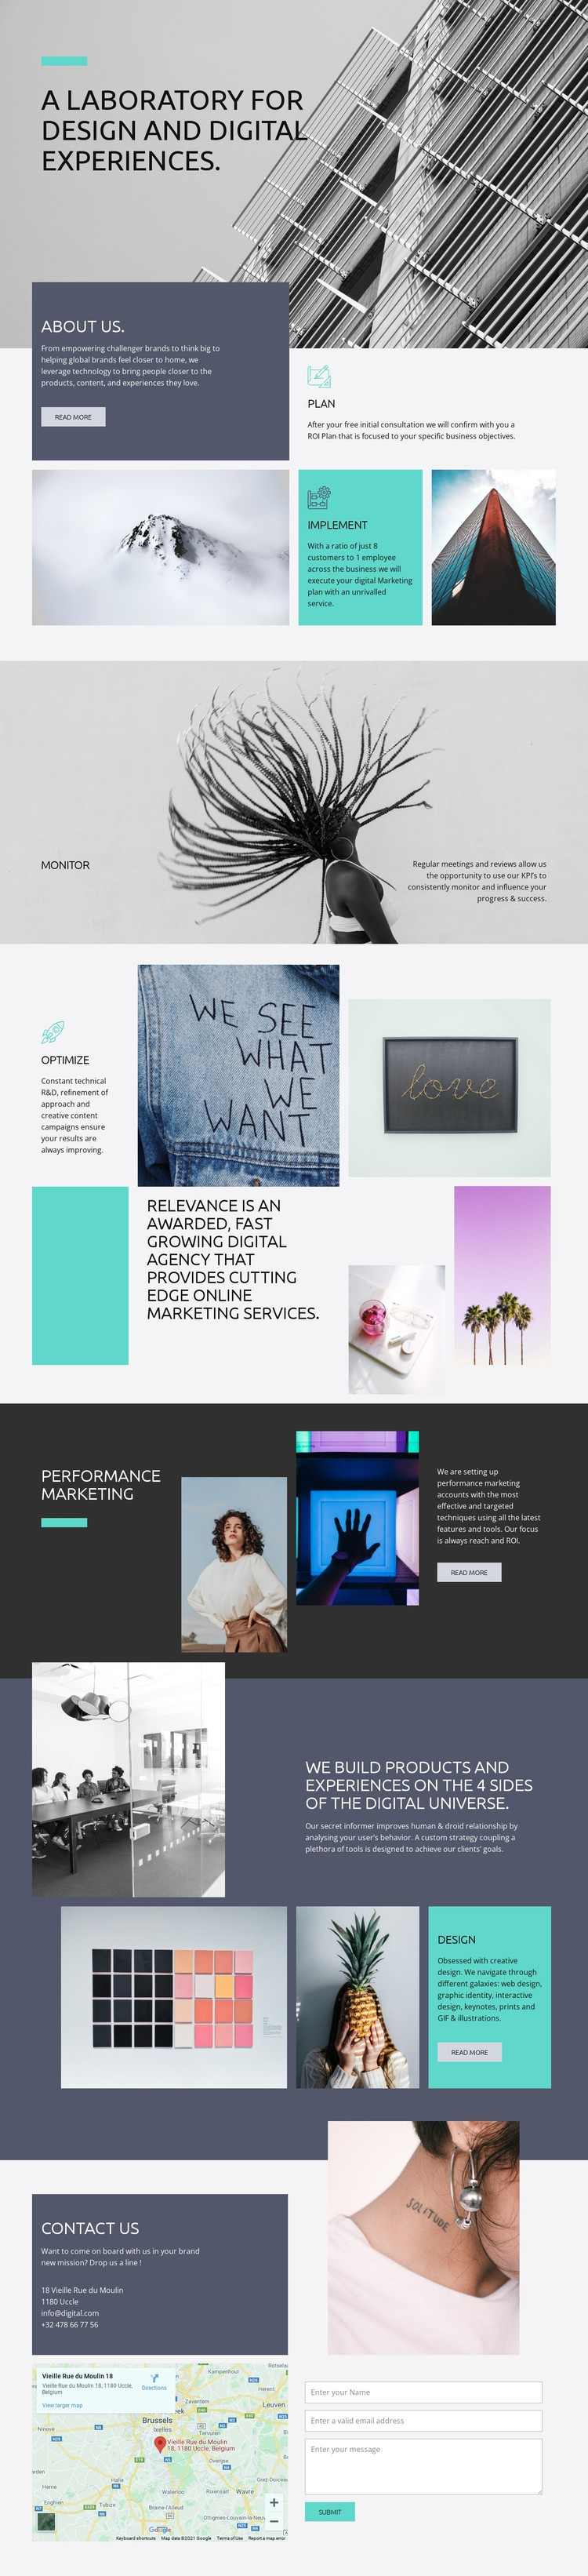 Creative lab for digital art CSS Template